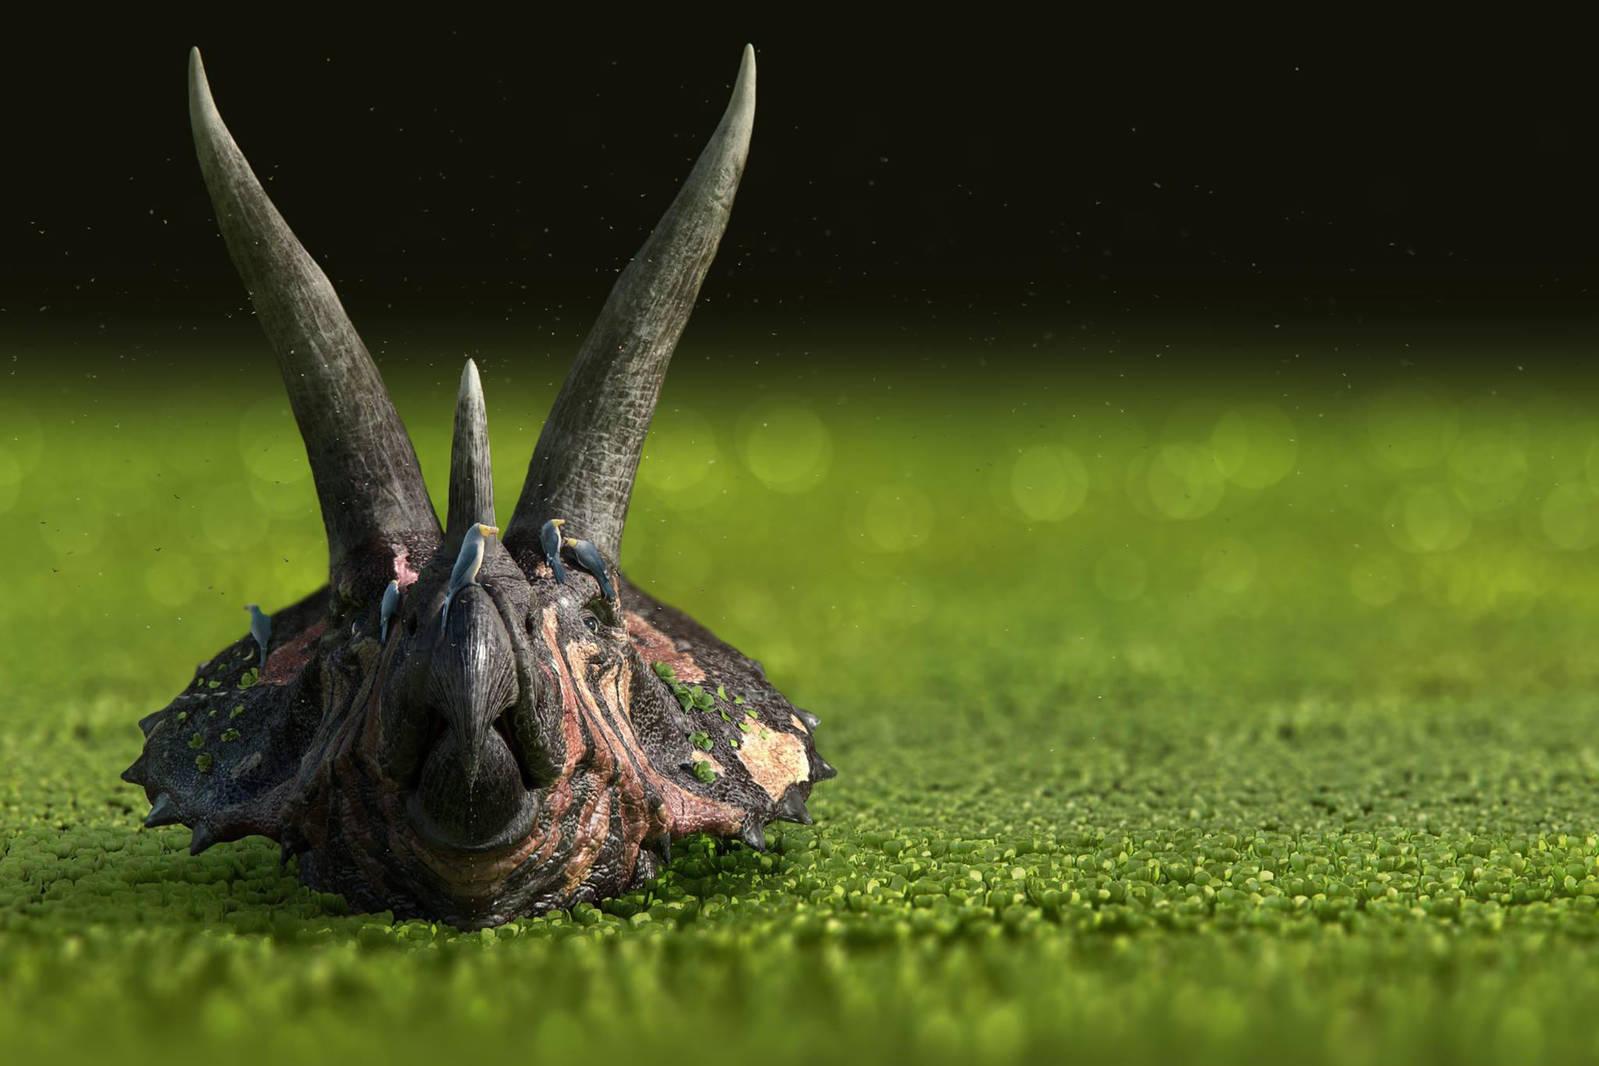 Dinosaurs In The Wild by damir-g-martin